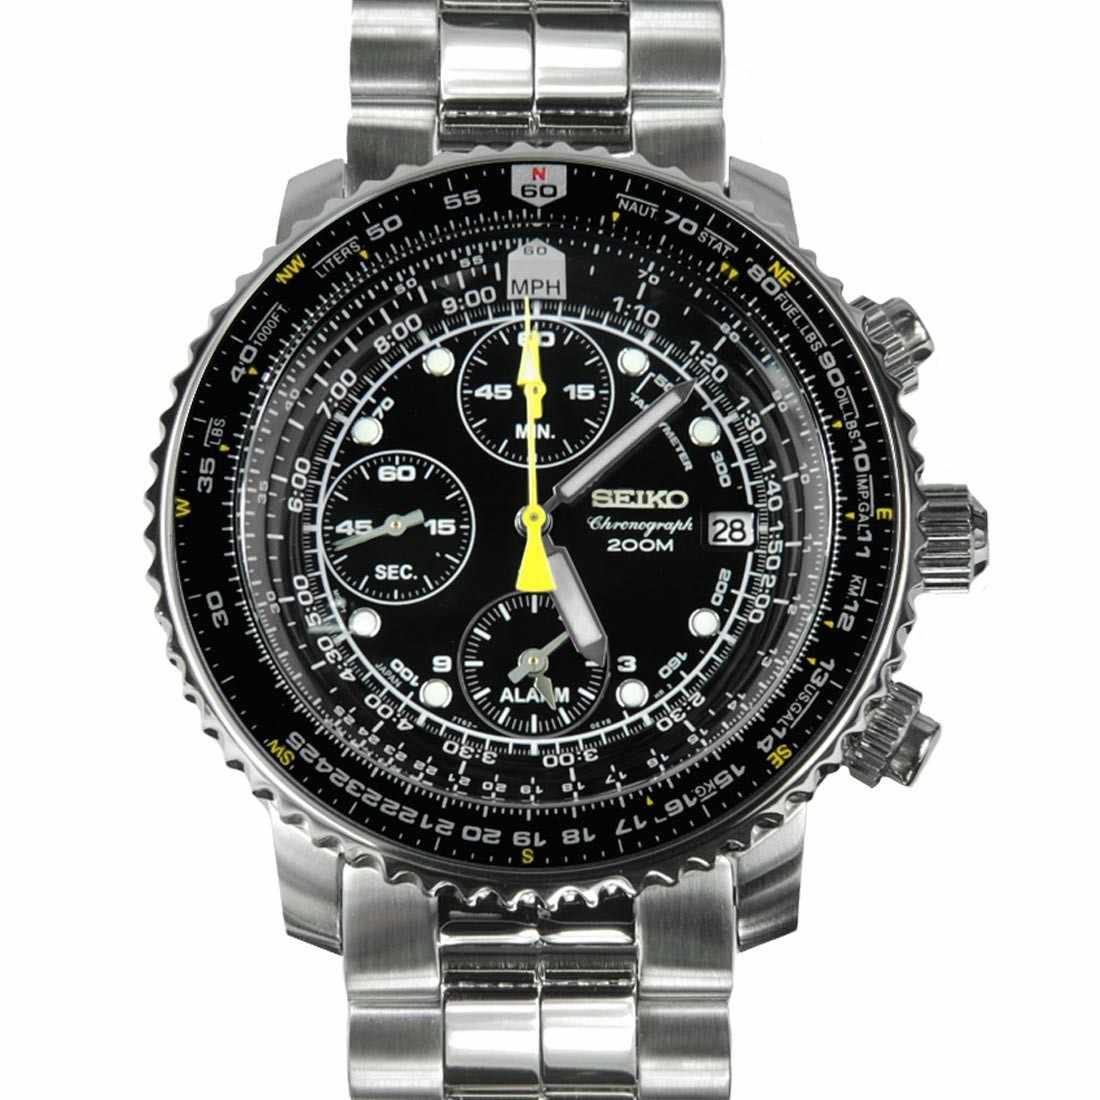 seiko sna411 watch review